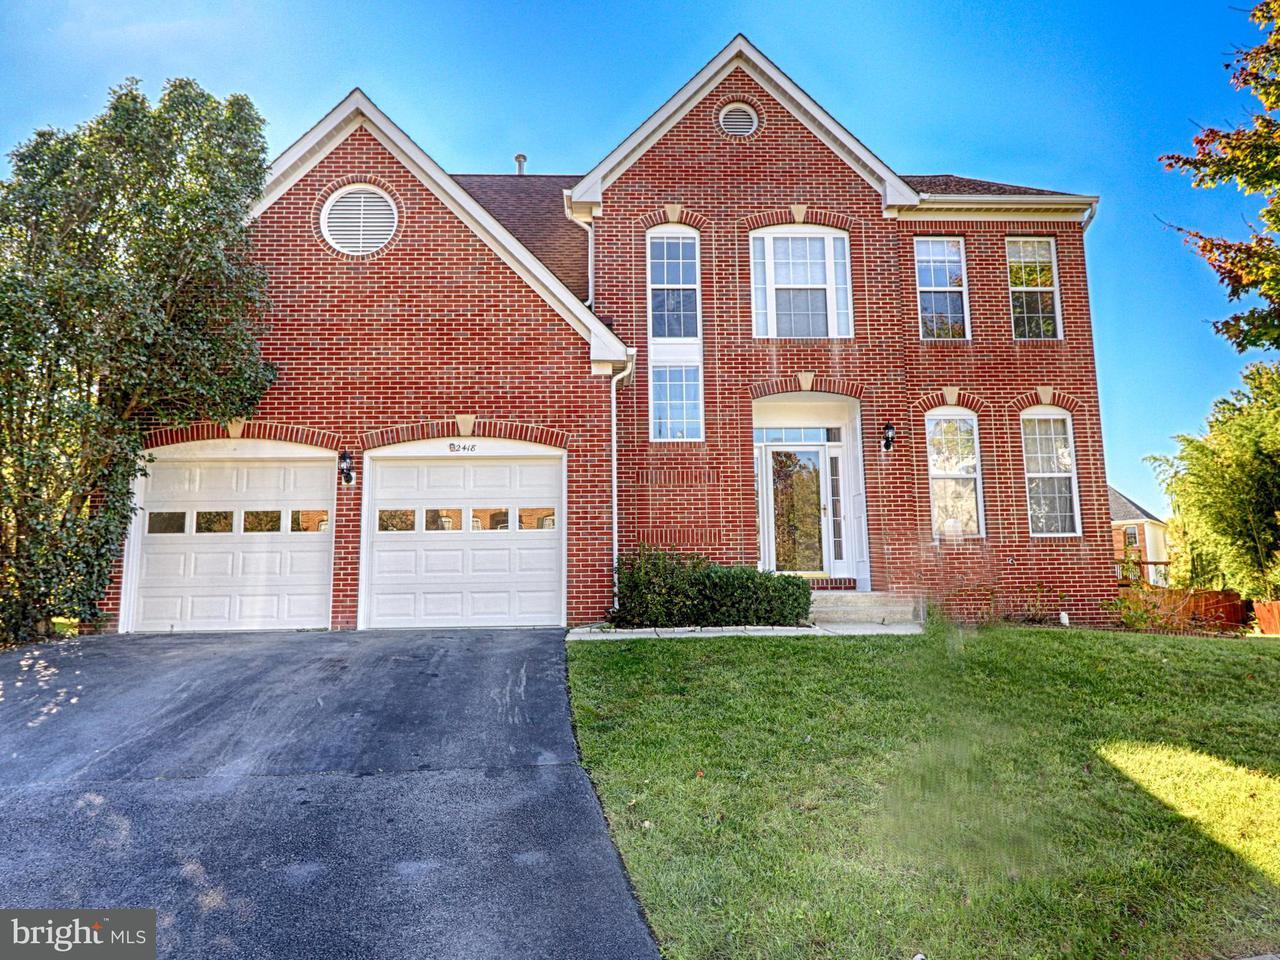 Additional photo for property listing at 2418 DAKOTA LAKES Drive 2418 DAKOTA LAKES Drive Herndon, Virginia 20171 United States